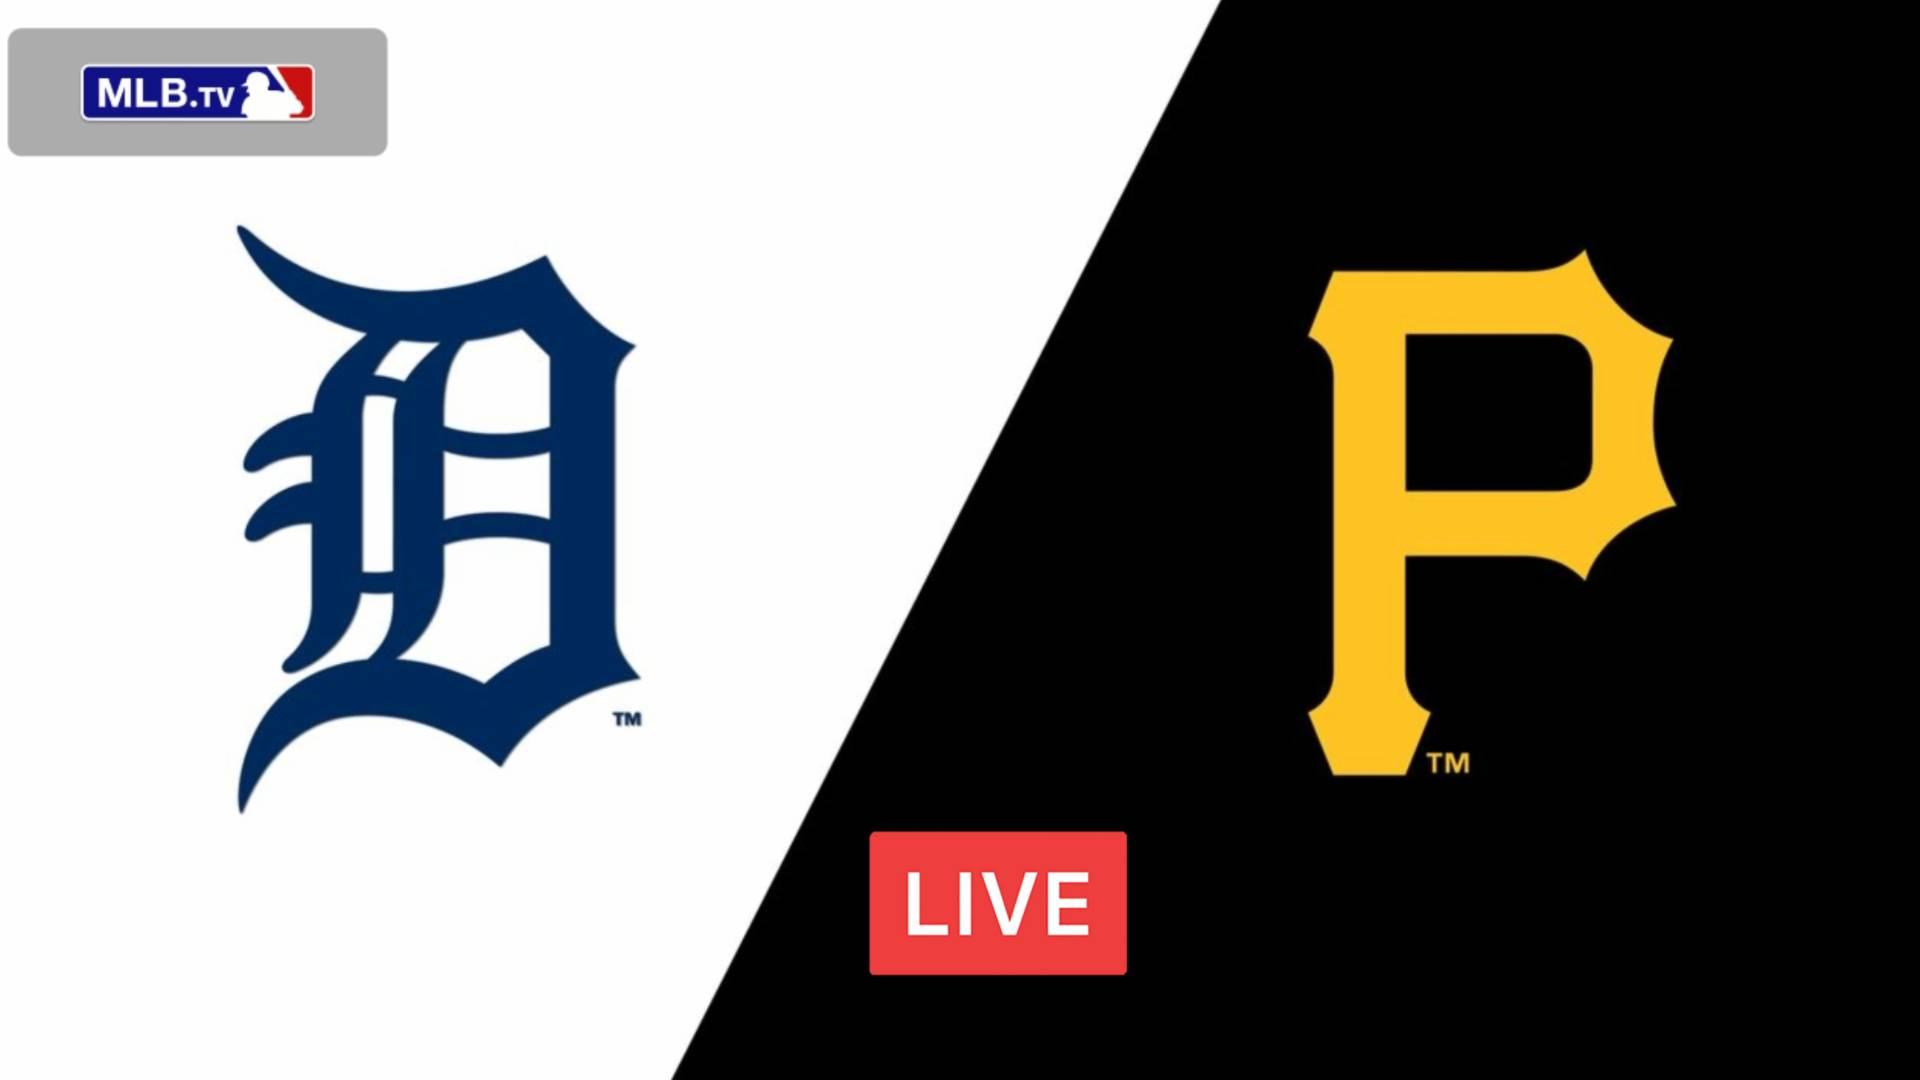 EN VIVO Detroit Tigers vs. Pittsburgh Pirates LIVE ONLINE